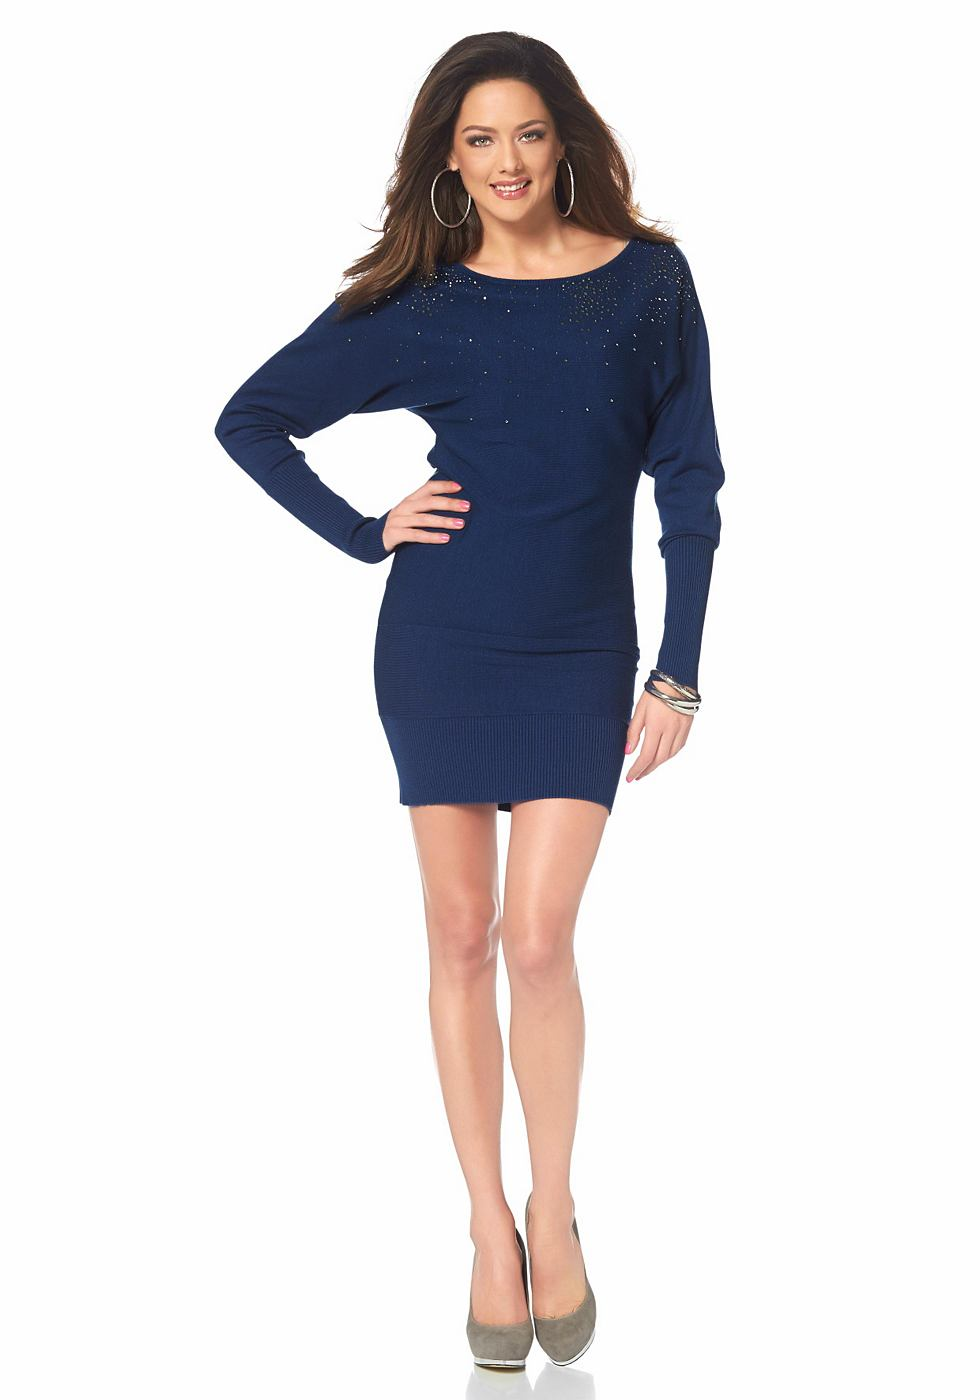 Melrose Tricot-jurk met glinstersteentjes blauw